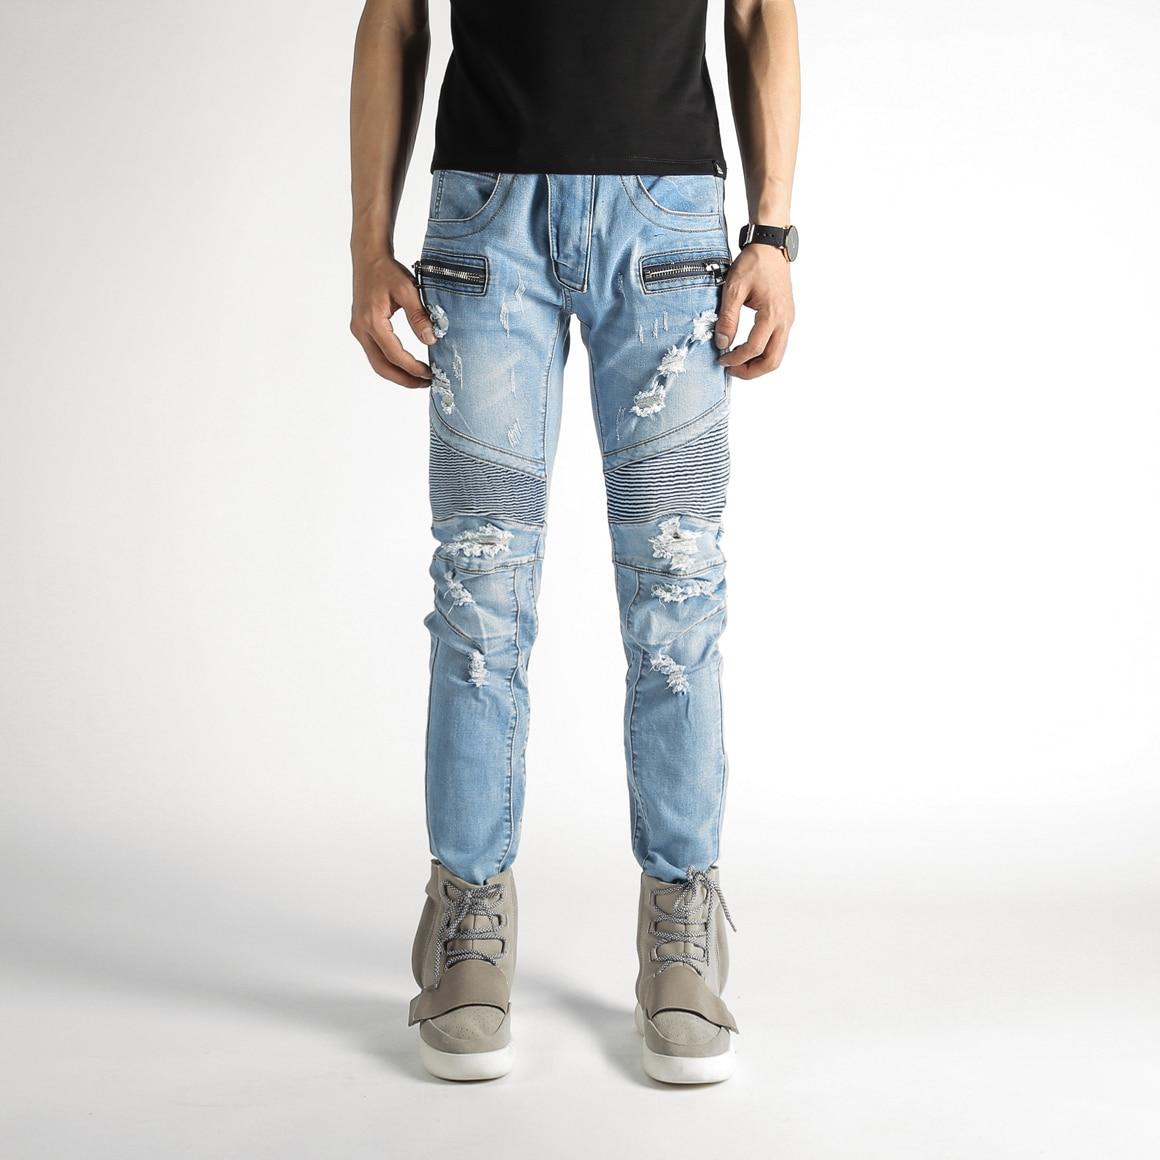 Fashion Men's Classic Jeans Straight Full Length Casual Elastic Design Men Slim Biker Jeans Man Denim Skinny Jeans Men 2017 fashion patch jeans men slim straight denim jeans ripped trousers new famous brand biker jeans logo mens zipper jeans 604